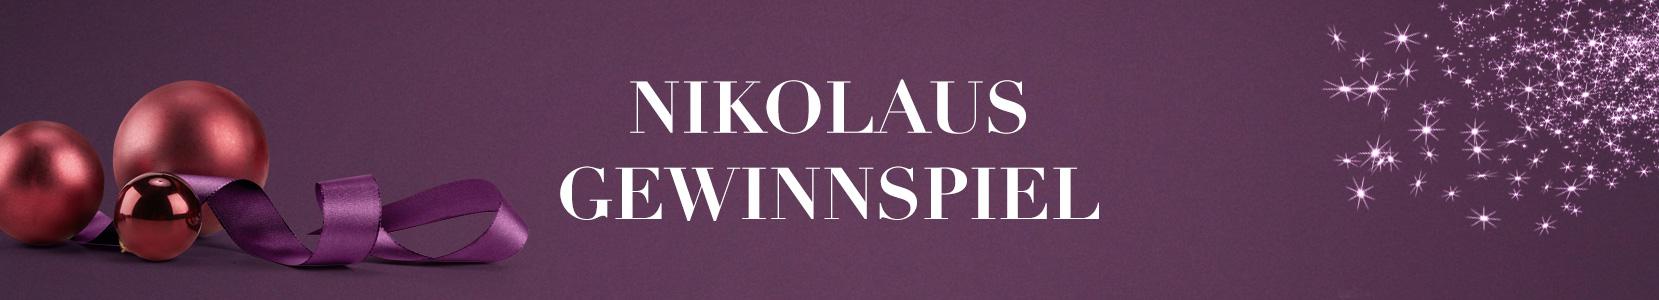 1659x300_Nikolaus_Gewinnspiel-0612